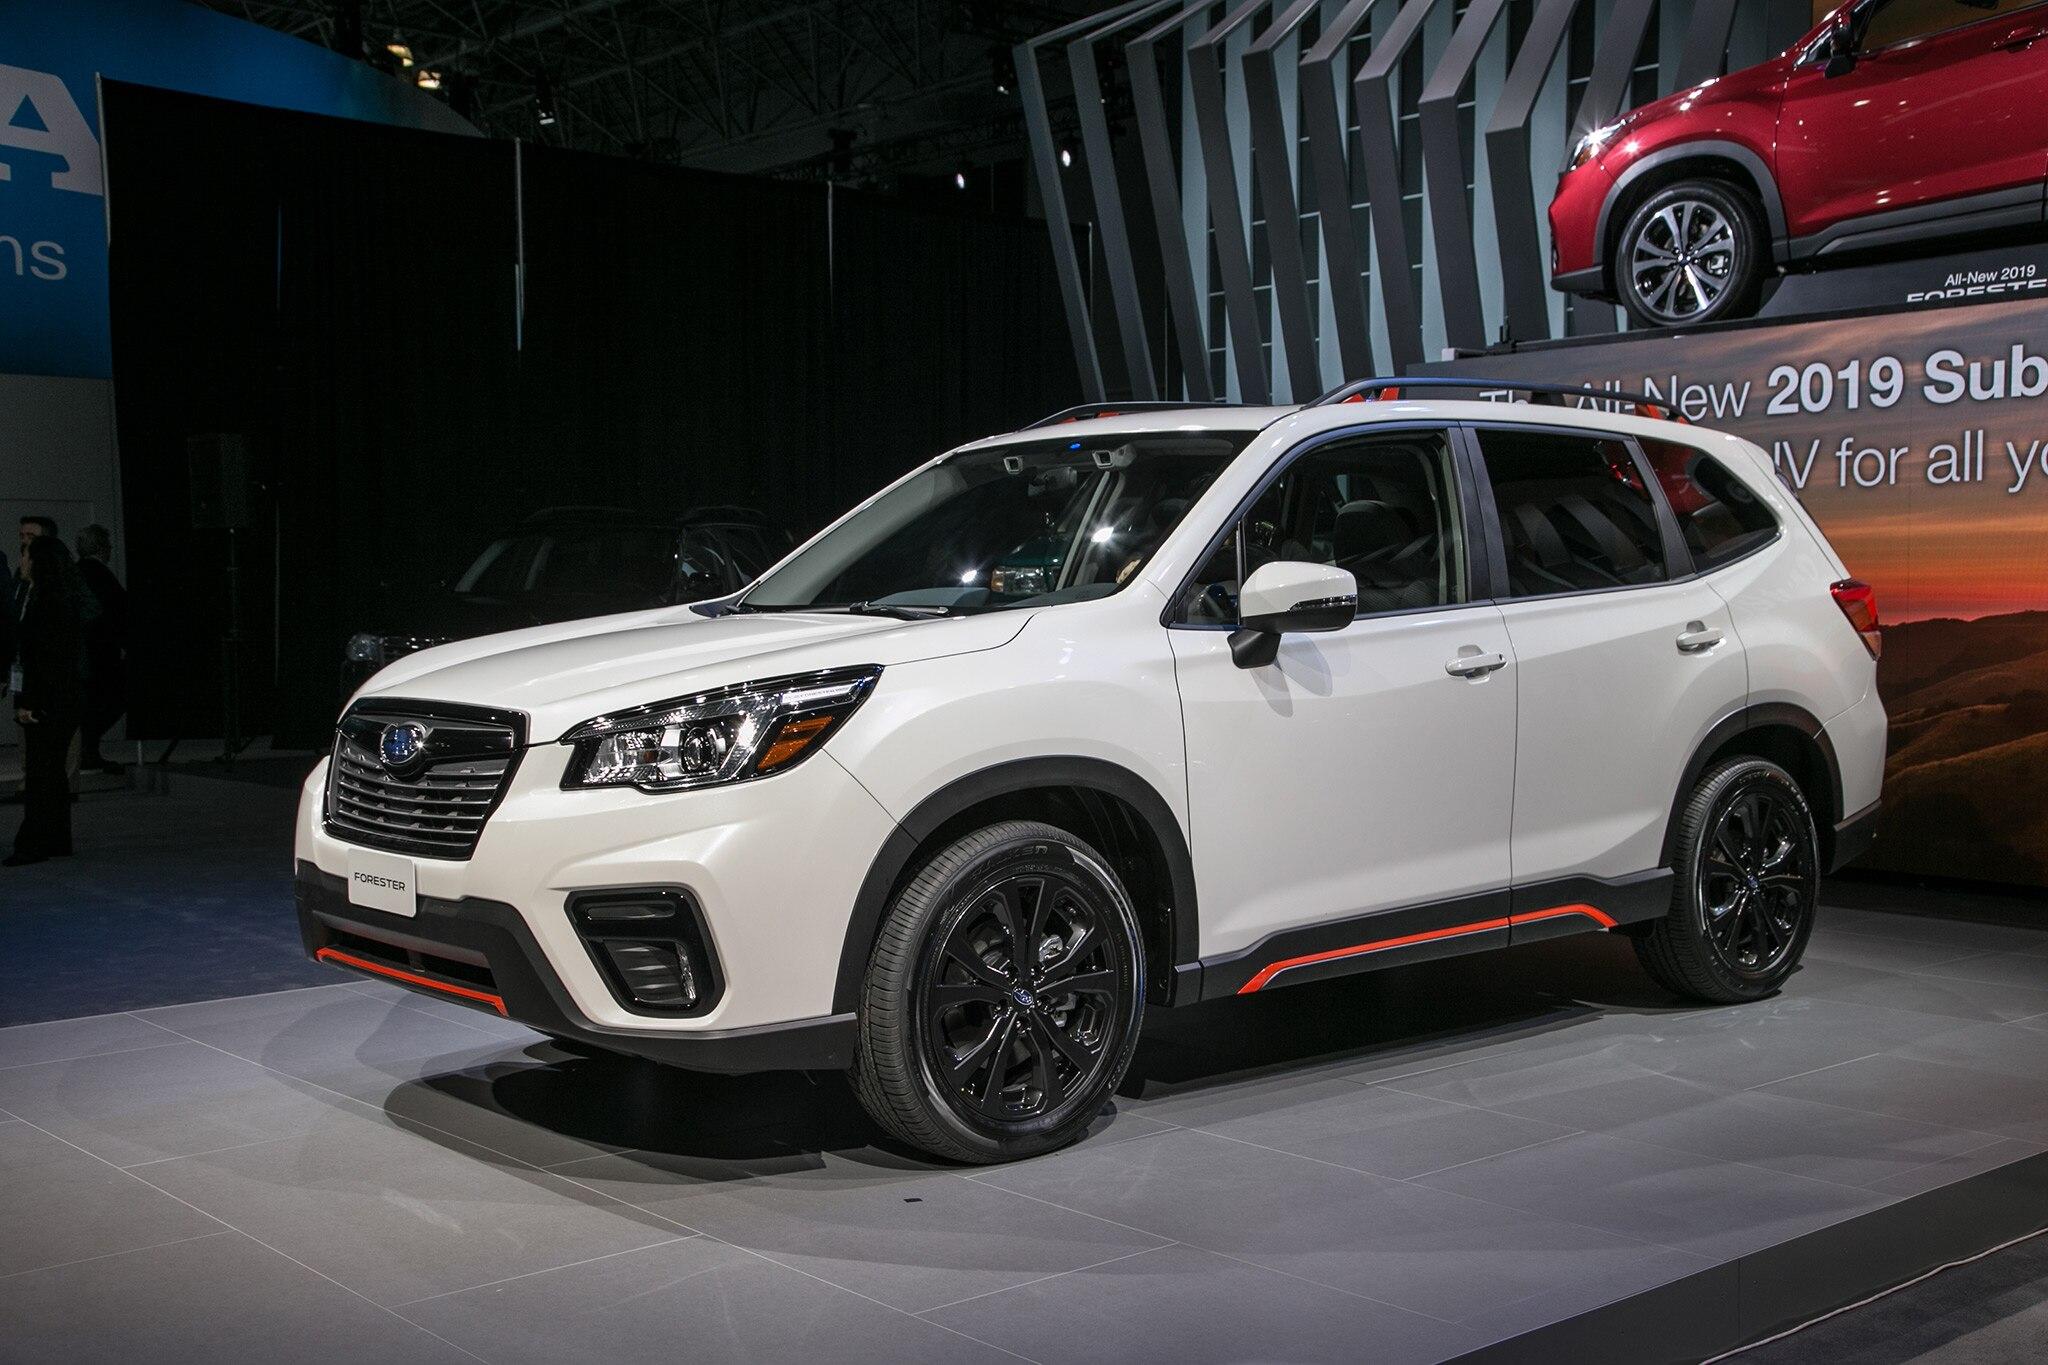 2019 Subaru Forester 2018 New York 01